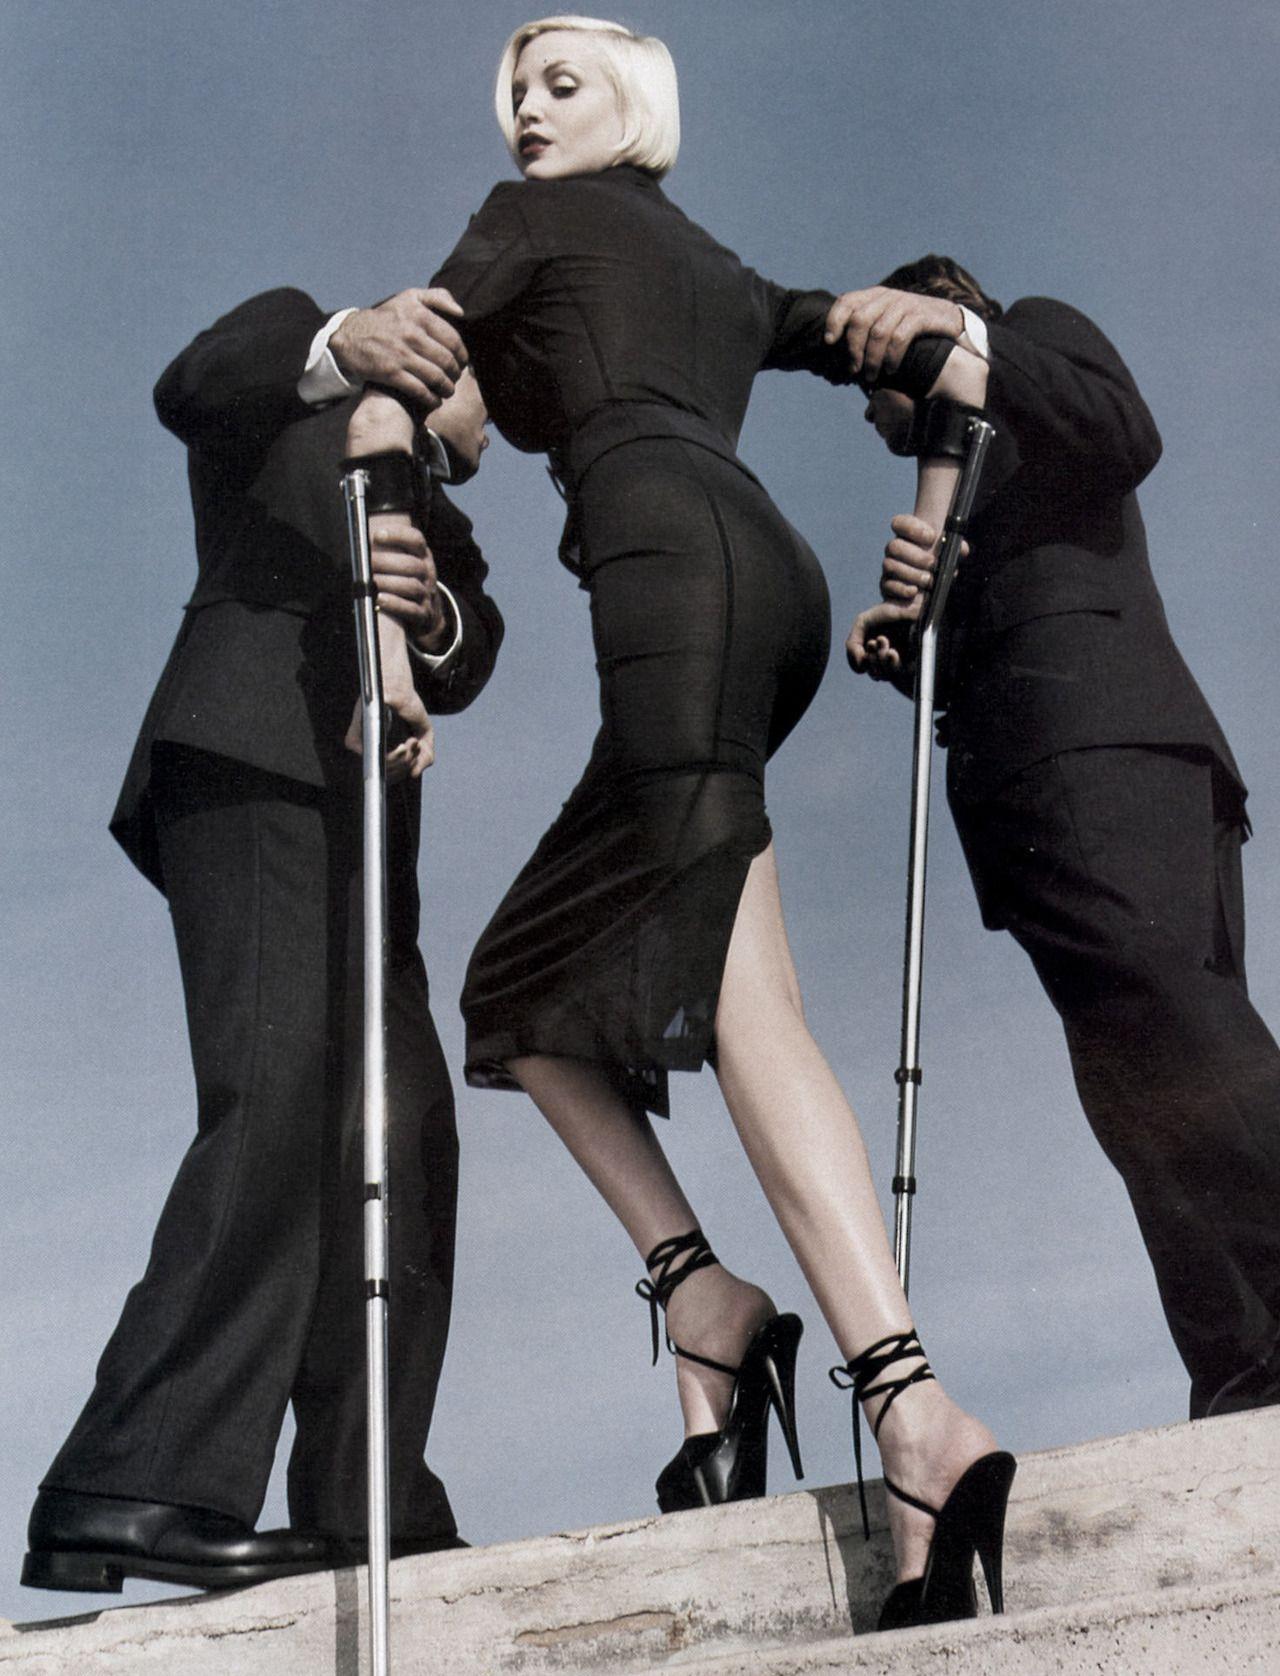 Vogue US, February 1995 ('High & Mighty'). Model: Nadja Auermann. Photographer: Helmut Newton.